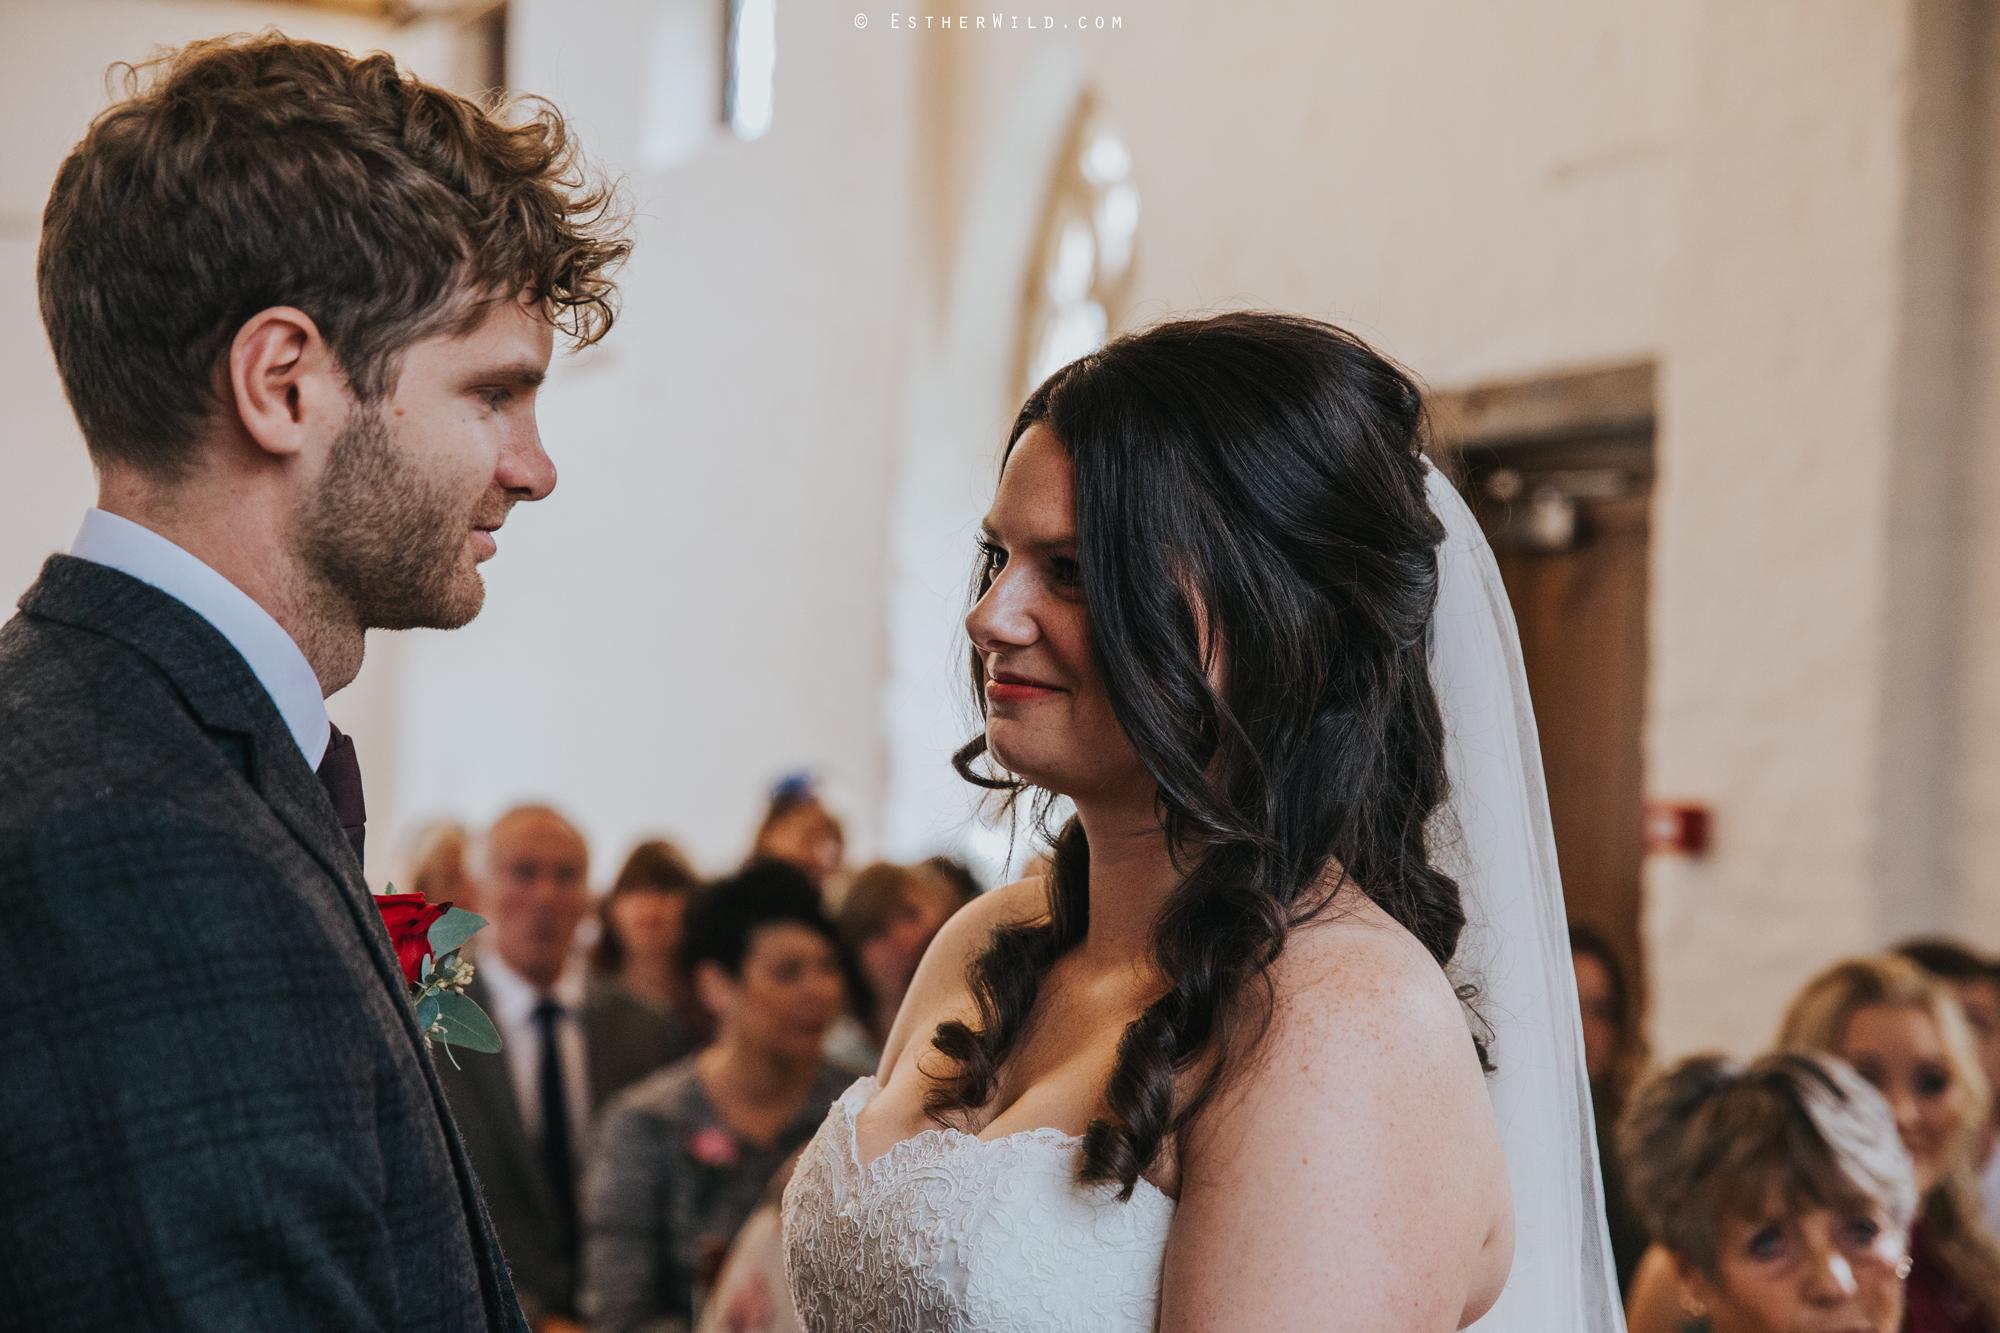 Reading_Room_Weddings_Alby_Norwich_Photographer_Esther_Wild_IMG_0963.jpg